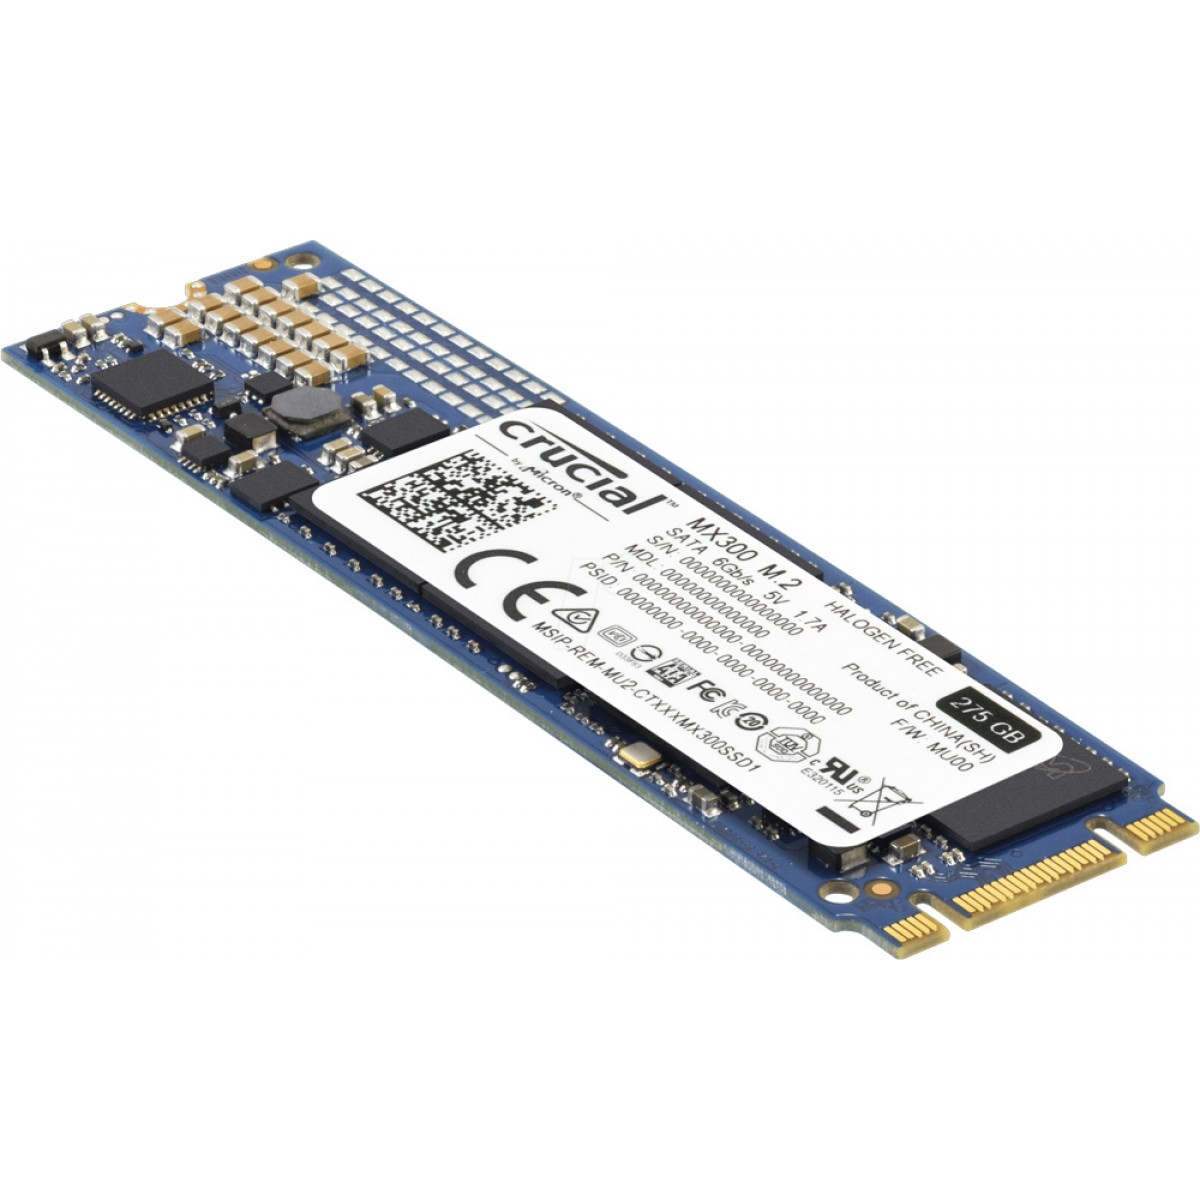 CRUCIAL MX300 275GB SSD M.2